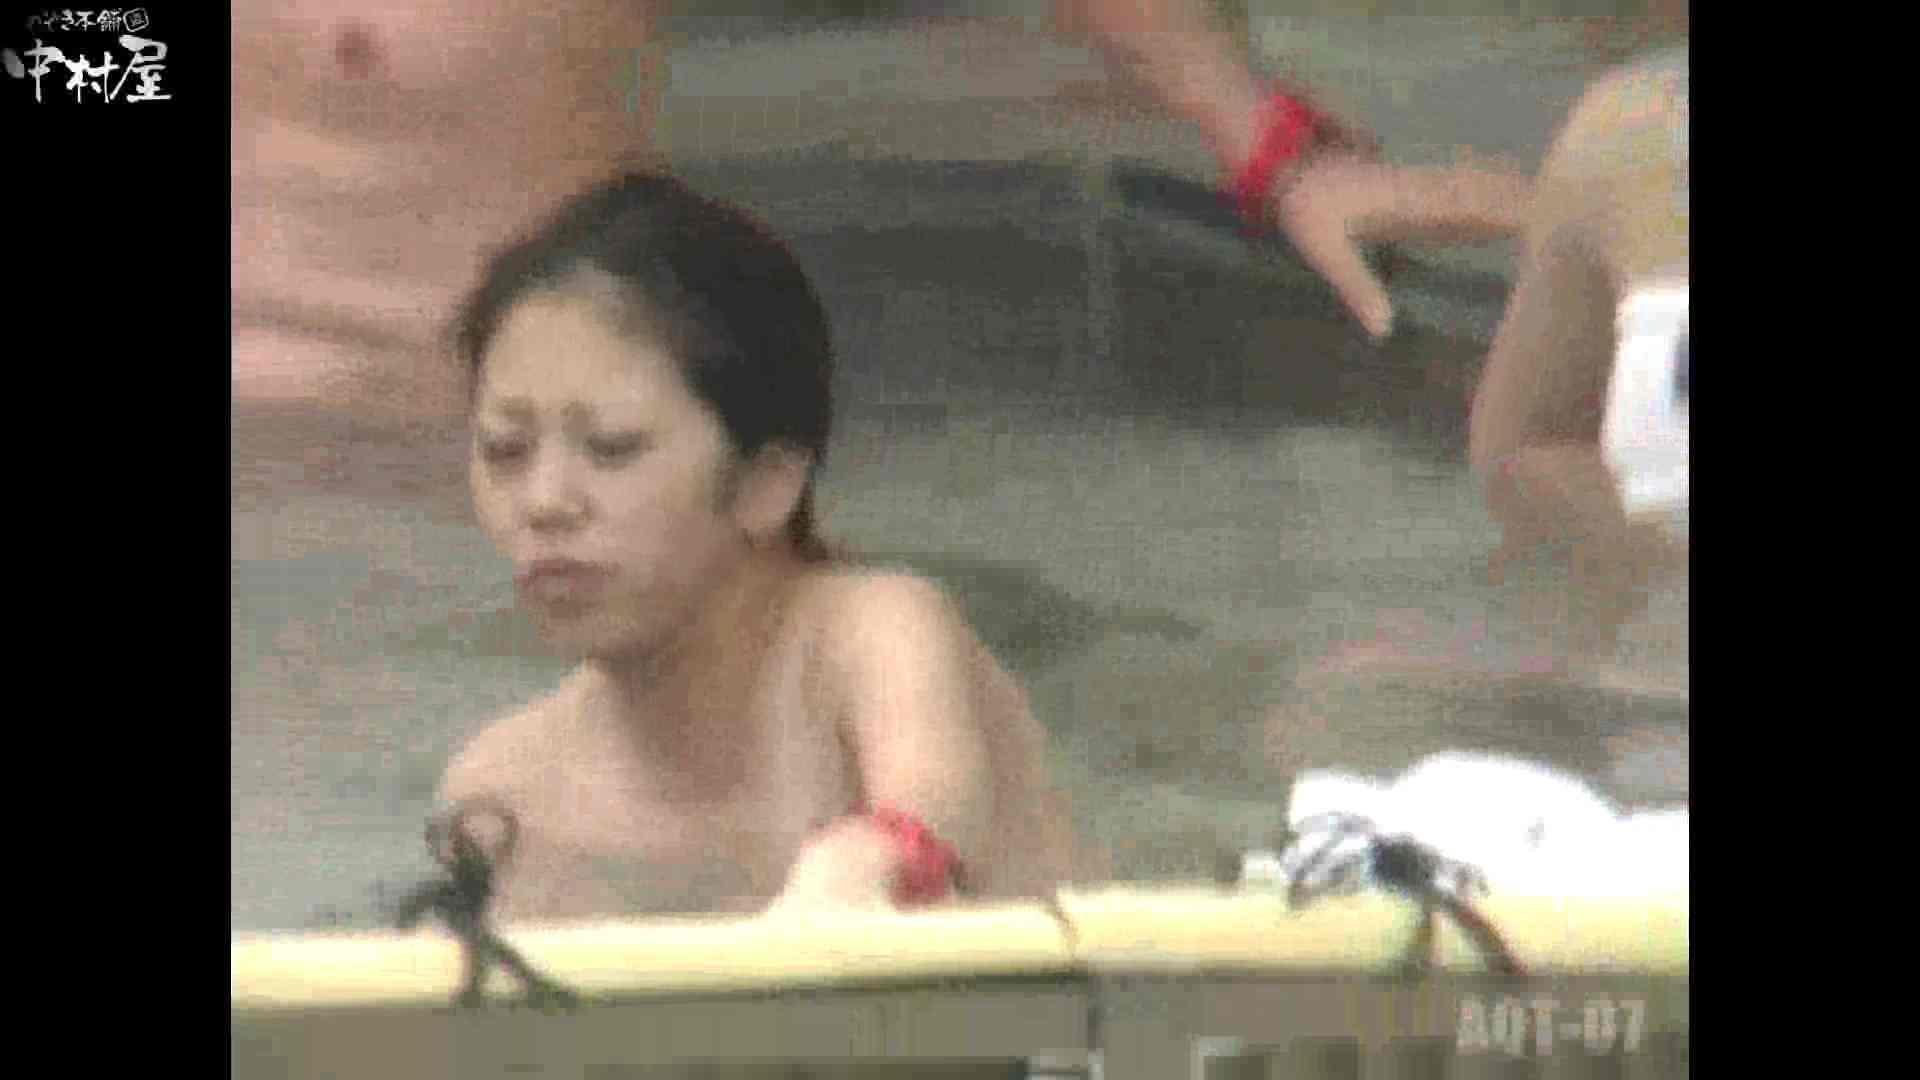 Aquaな露天風呂Vol.871潜入盗撮露天風呂七判湯 其の一 盗撮 のぞき動画画像 59枚 35